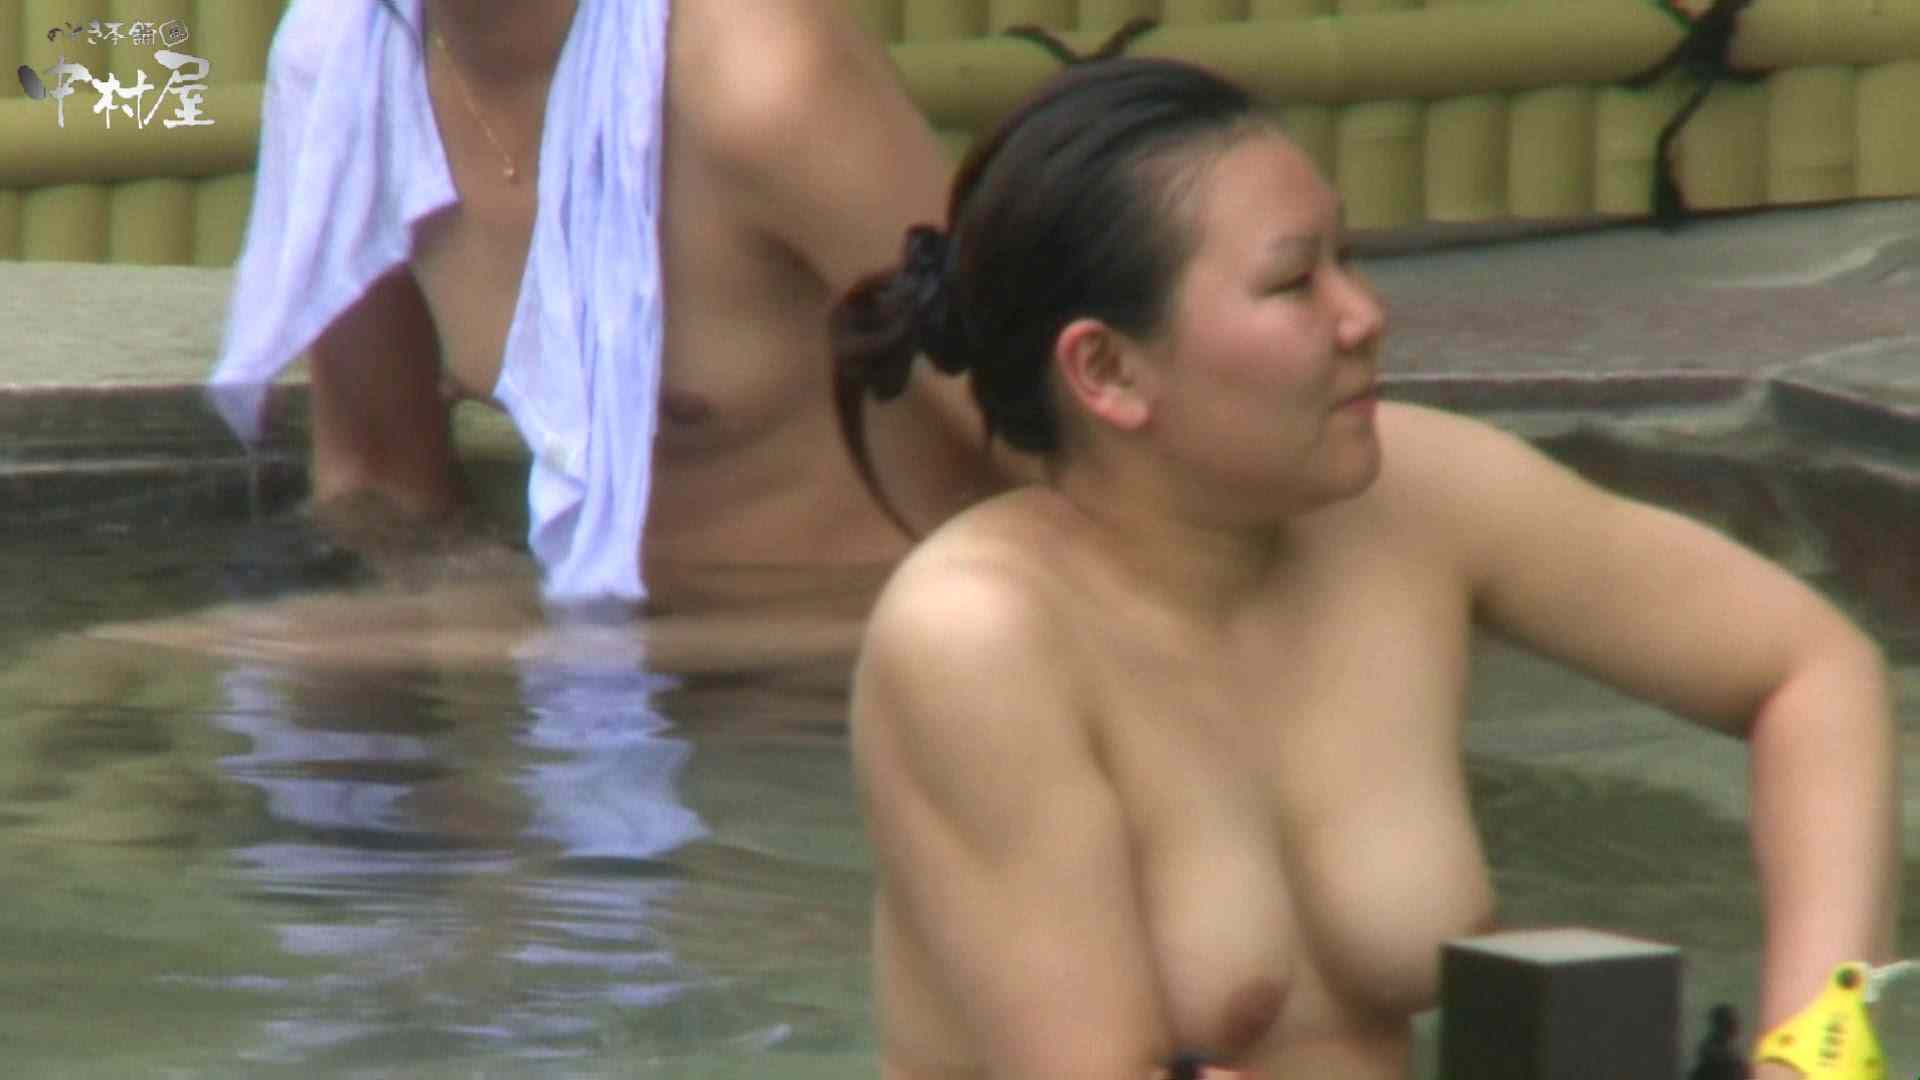 Aquaな露天風呂Vol.946 OLセックス | 盗撮  64画像 28